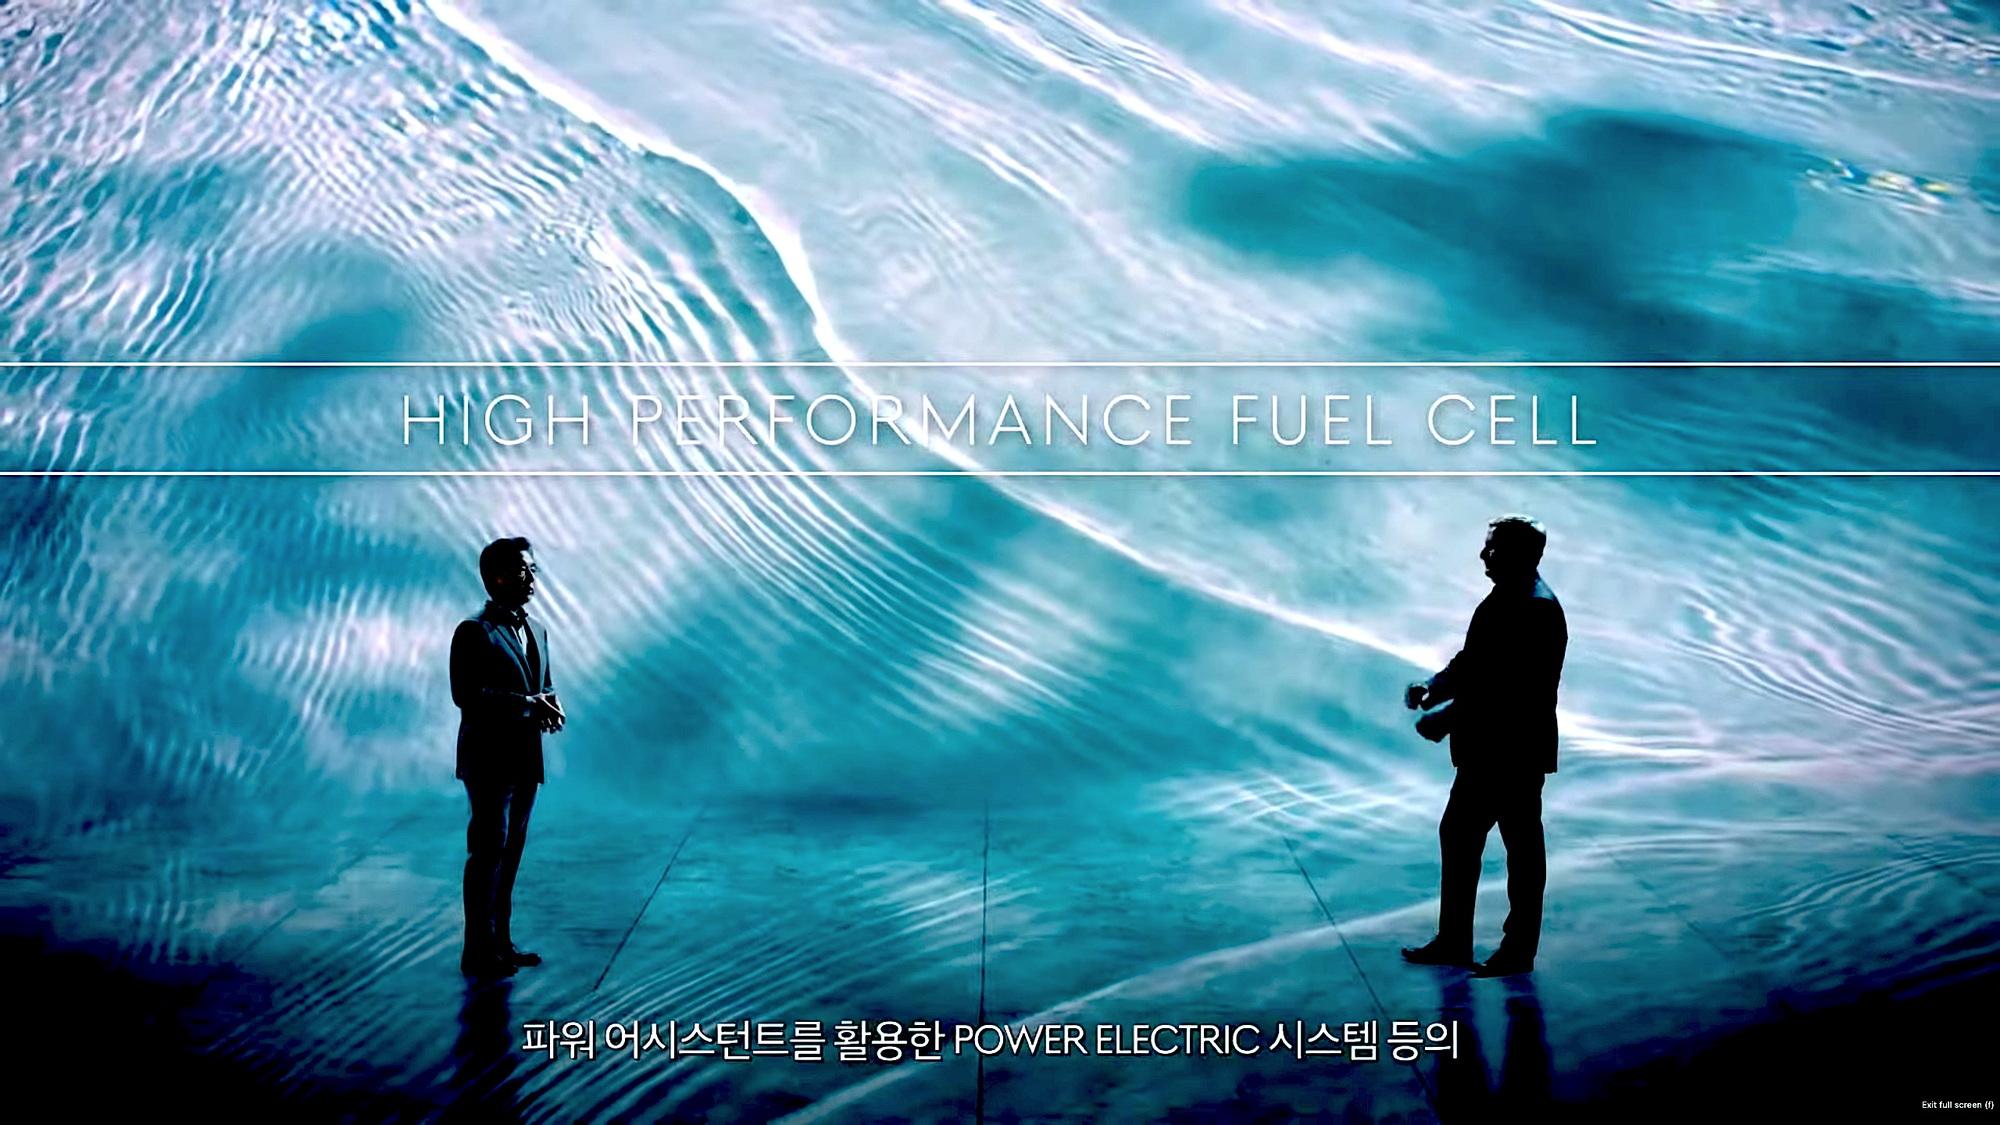 Genesis high-performance hydrogen fuel-cell teaser  -  September 2021